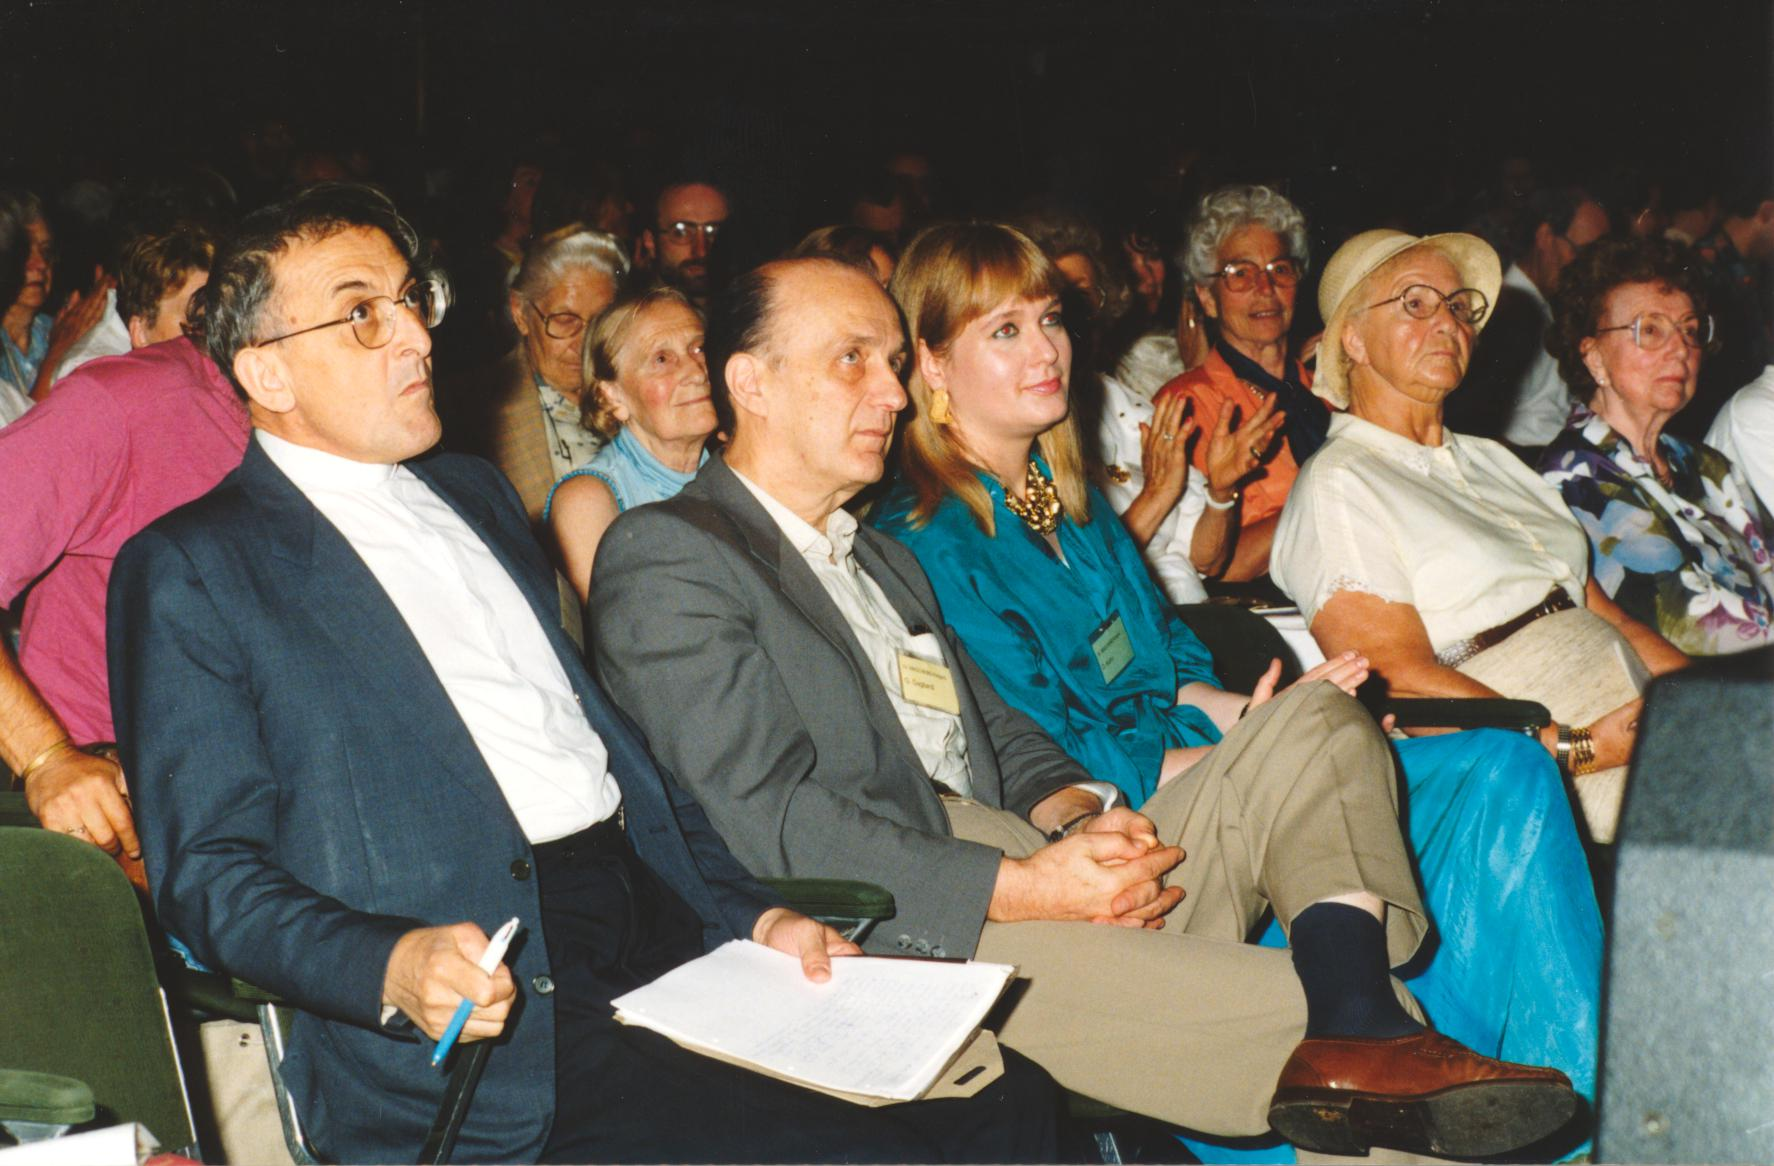 XV. Imago Mundi-Kongress 1995, Innsbruck, Teilnehmerfoto